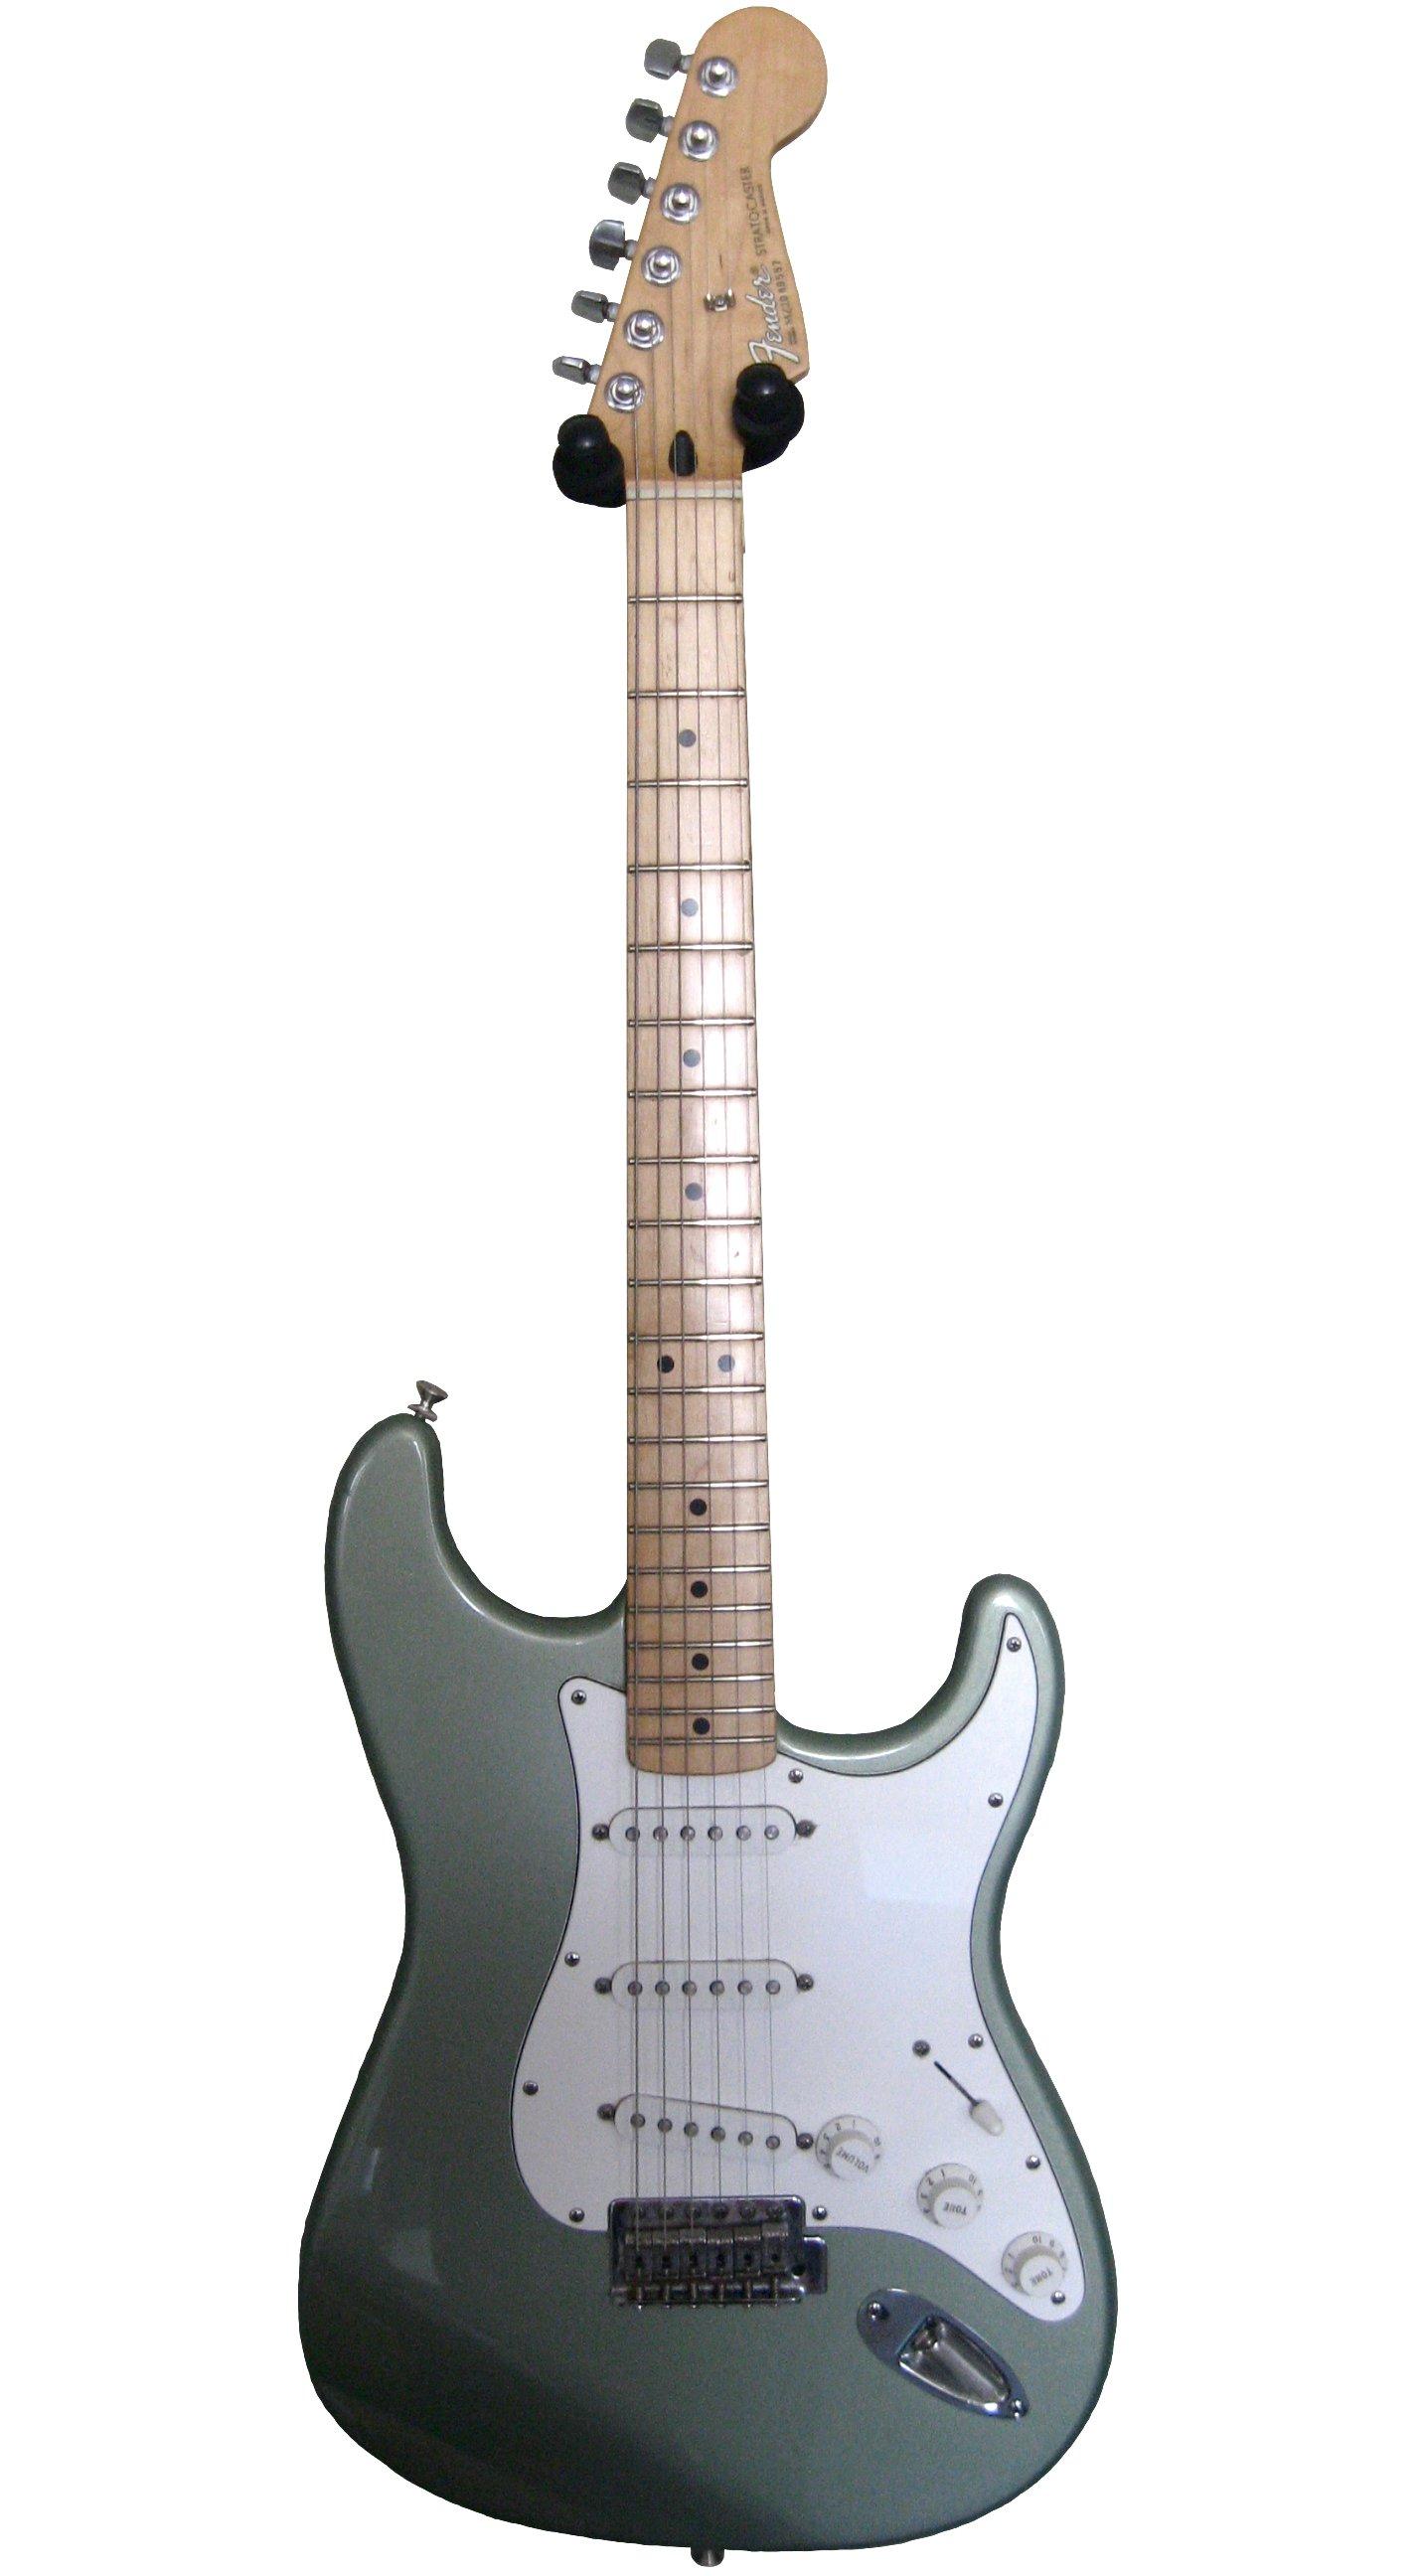 [DIAGRAM_38IS]  Fender Stratocaster - Wikipedia | Wiring Diagram Squier California Series Strat Stock |  | Wikipedia